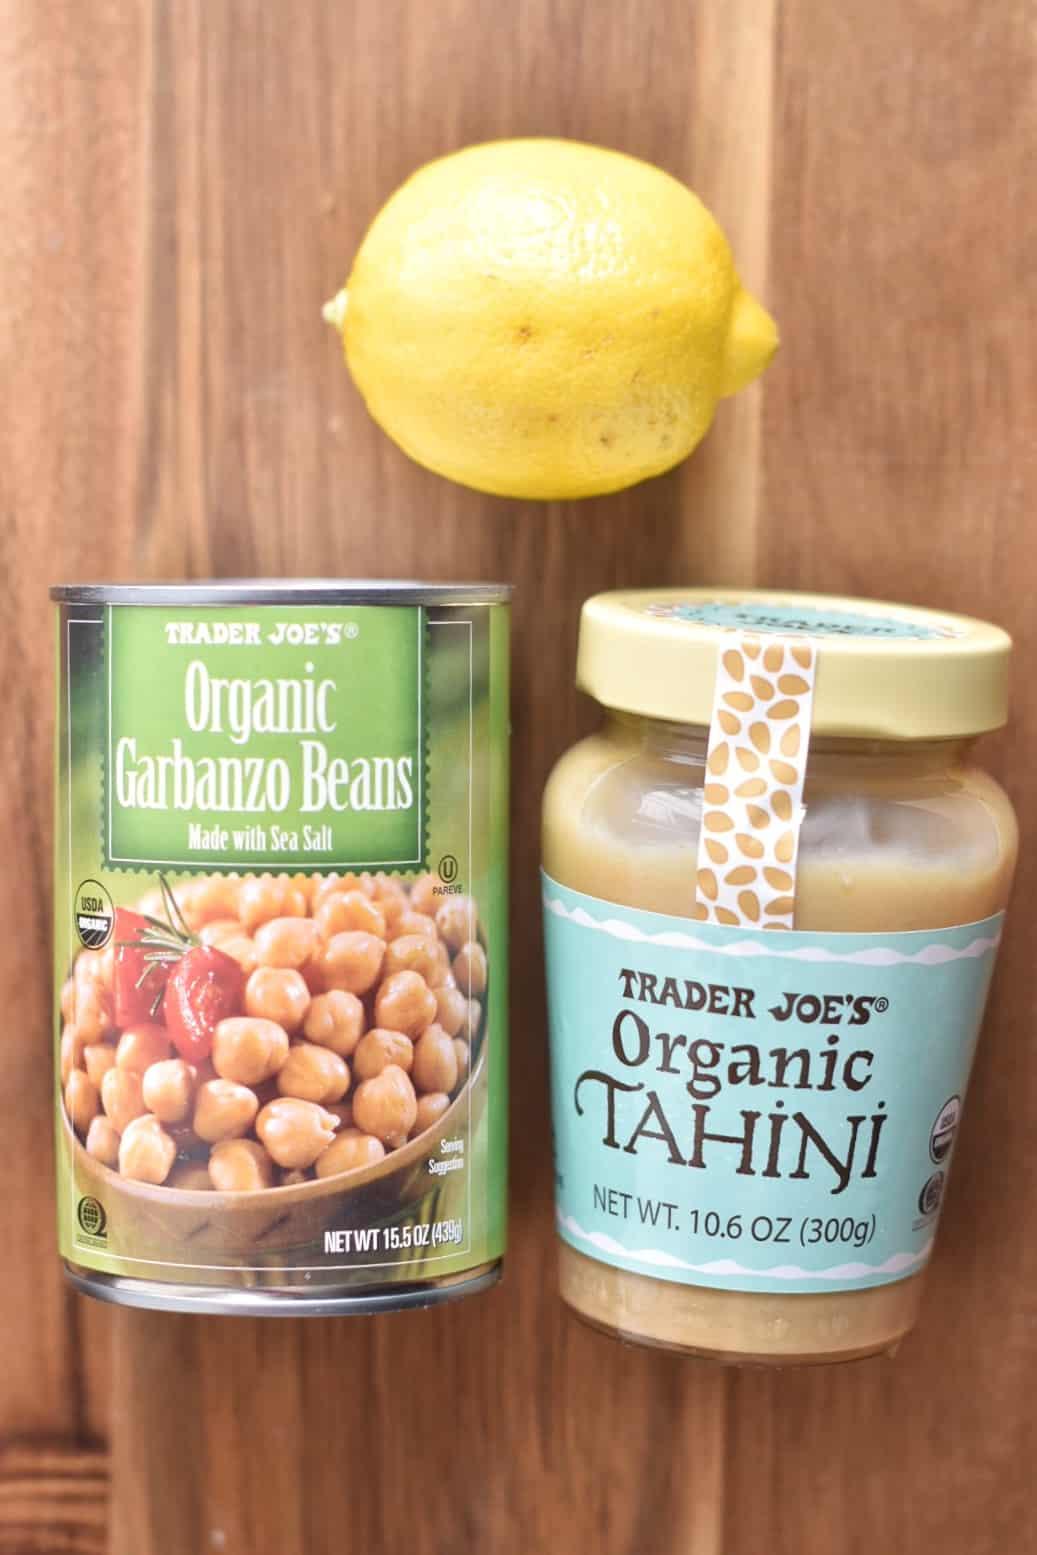 25+ Trader Joe's Healthy Snack Ideas #healthyeating #shoppinglist #favorites